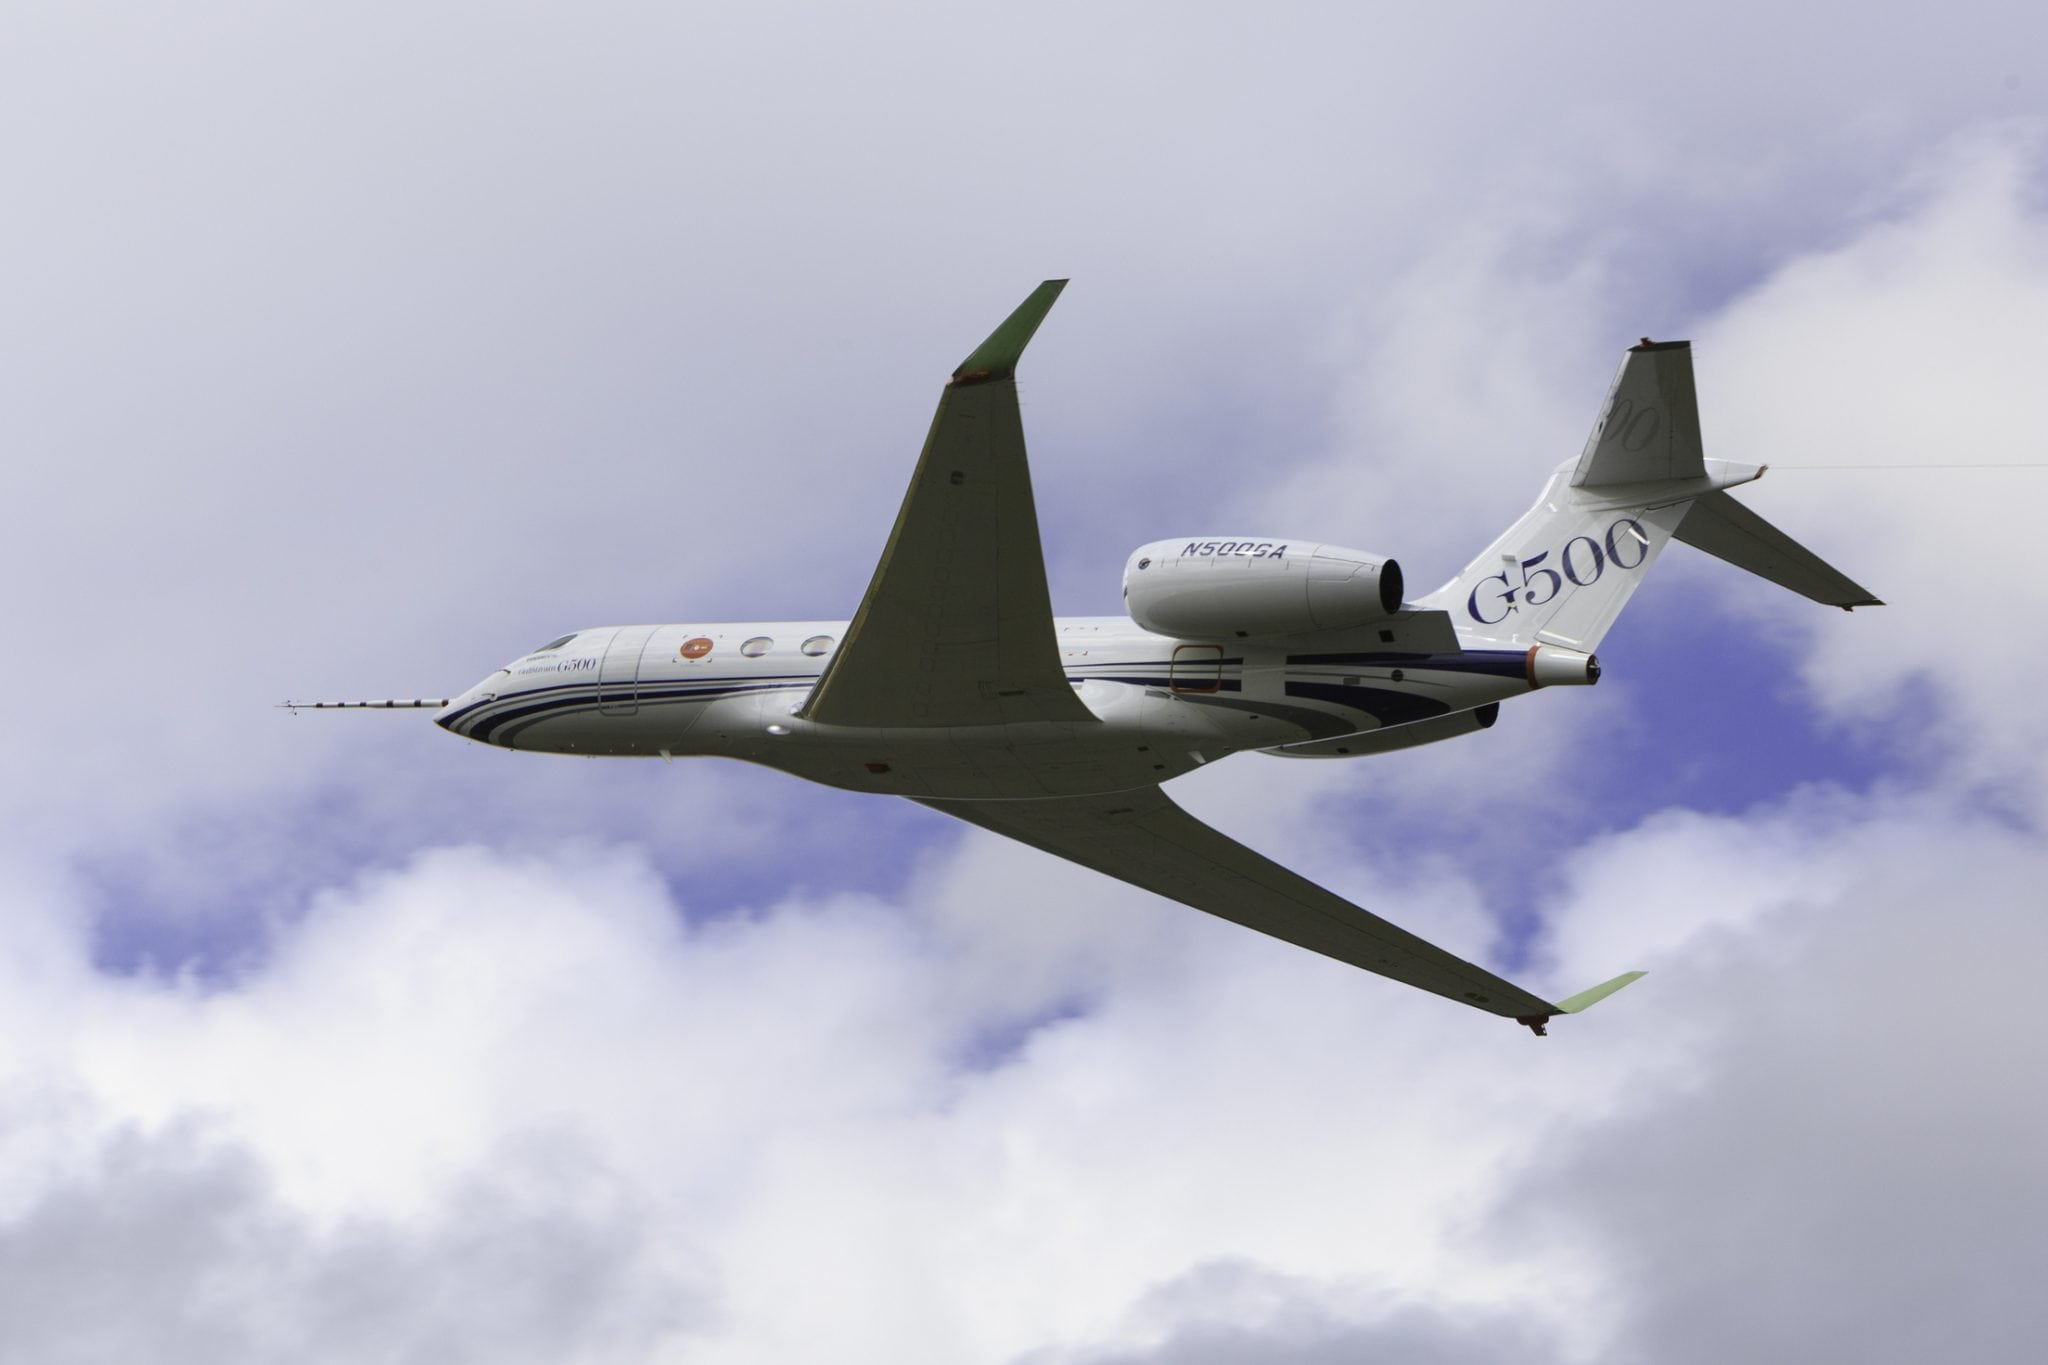 Gulfstream G500 aircraft